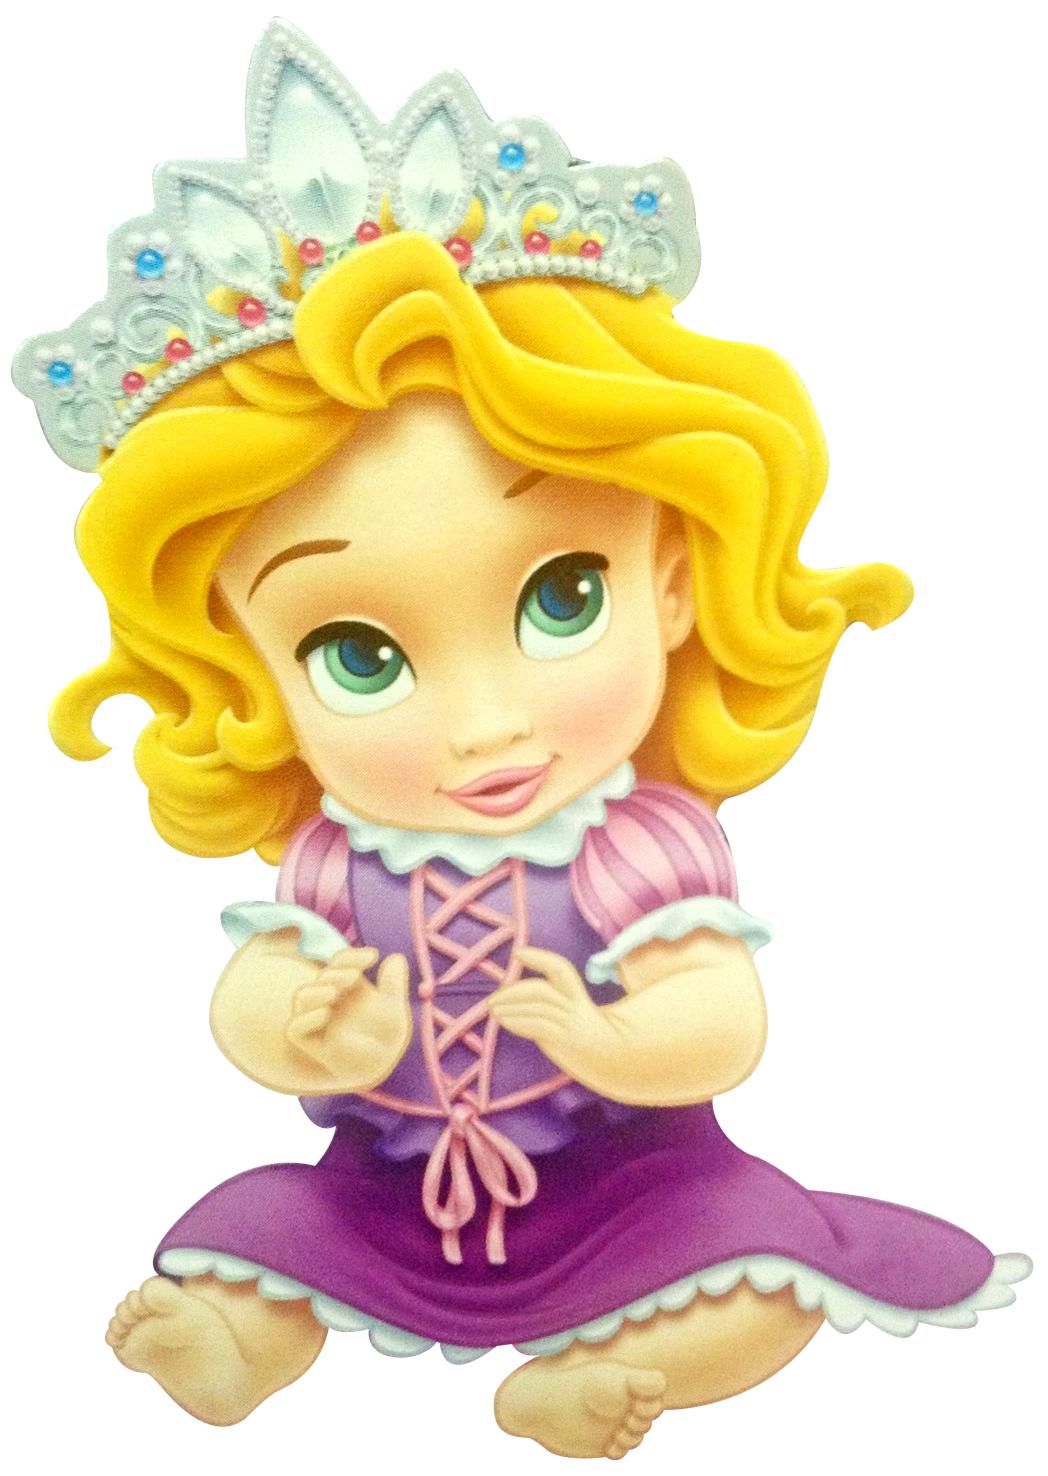 Rapunzel clipart baby. Princesas disney svg files